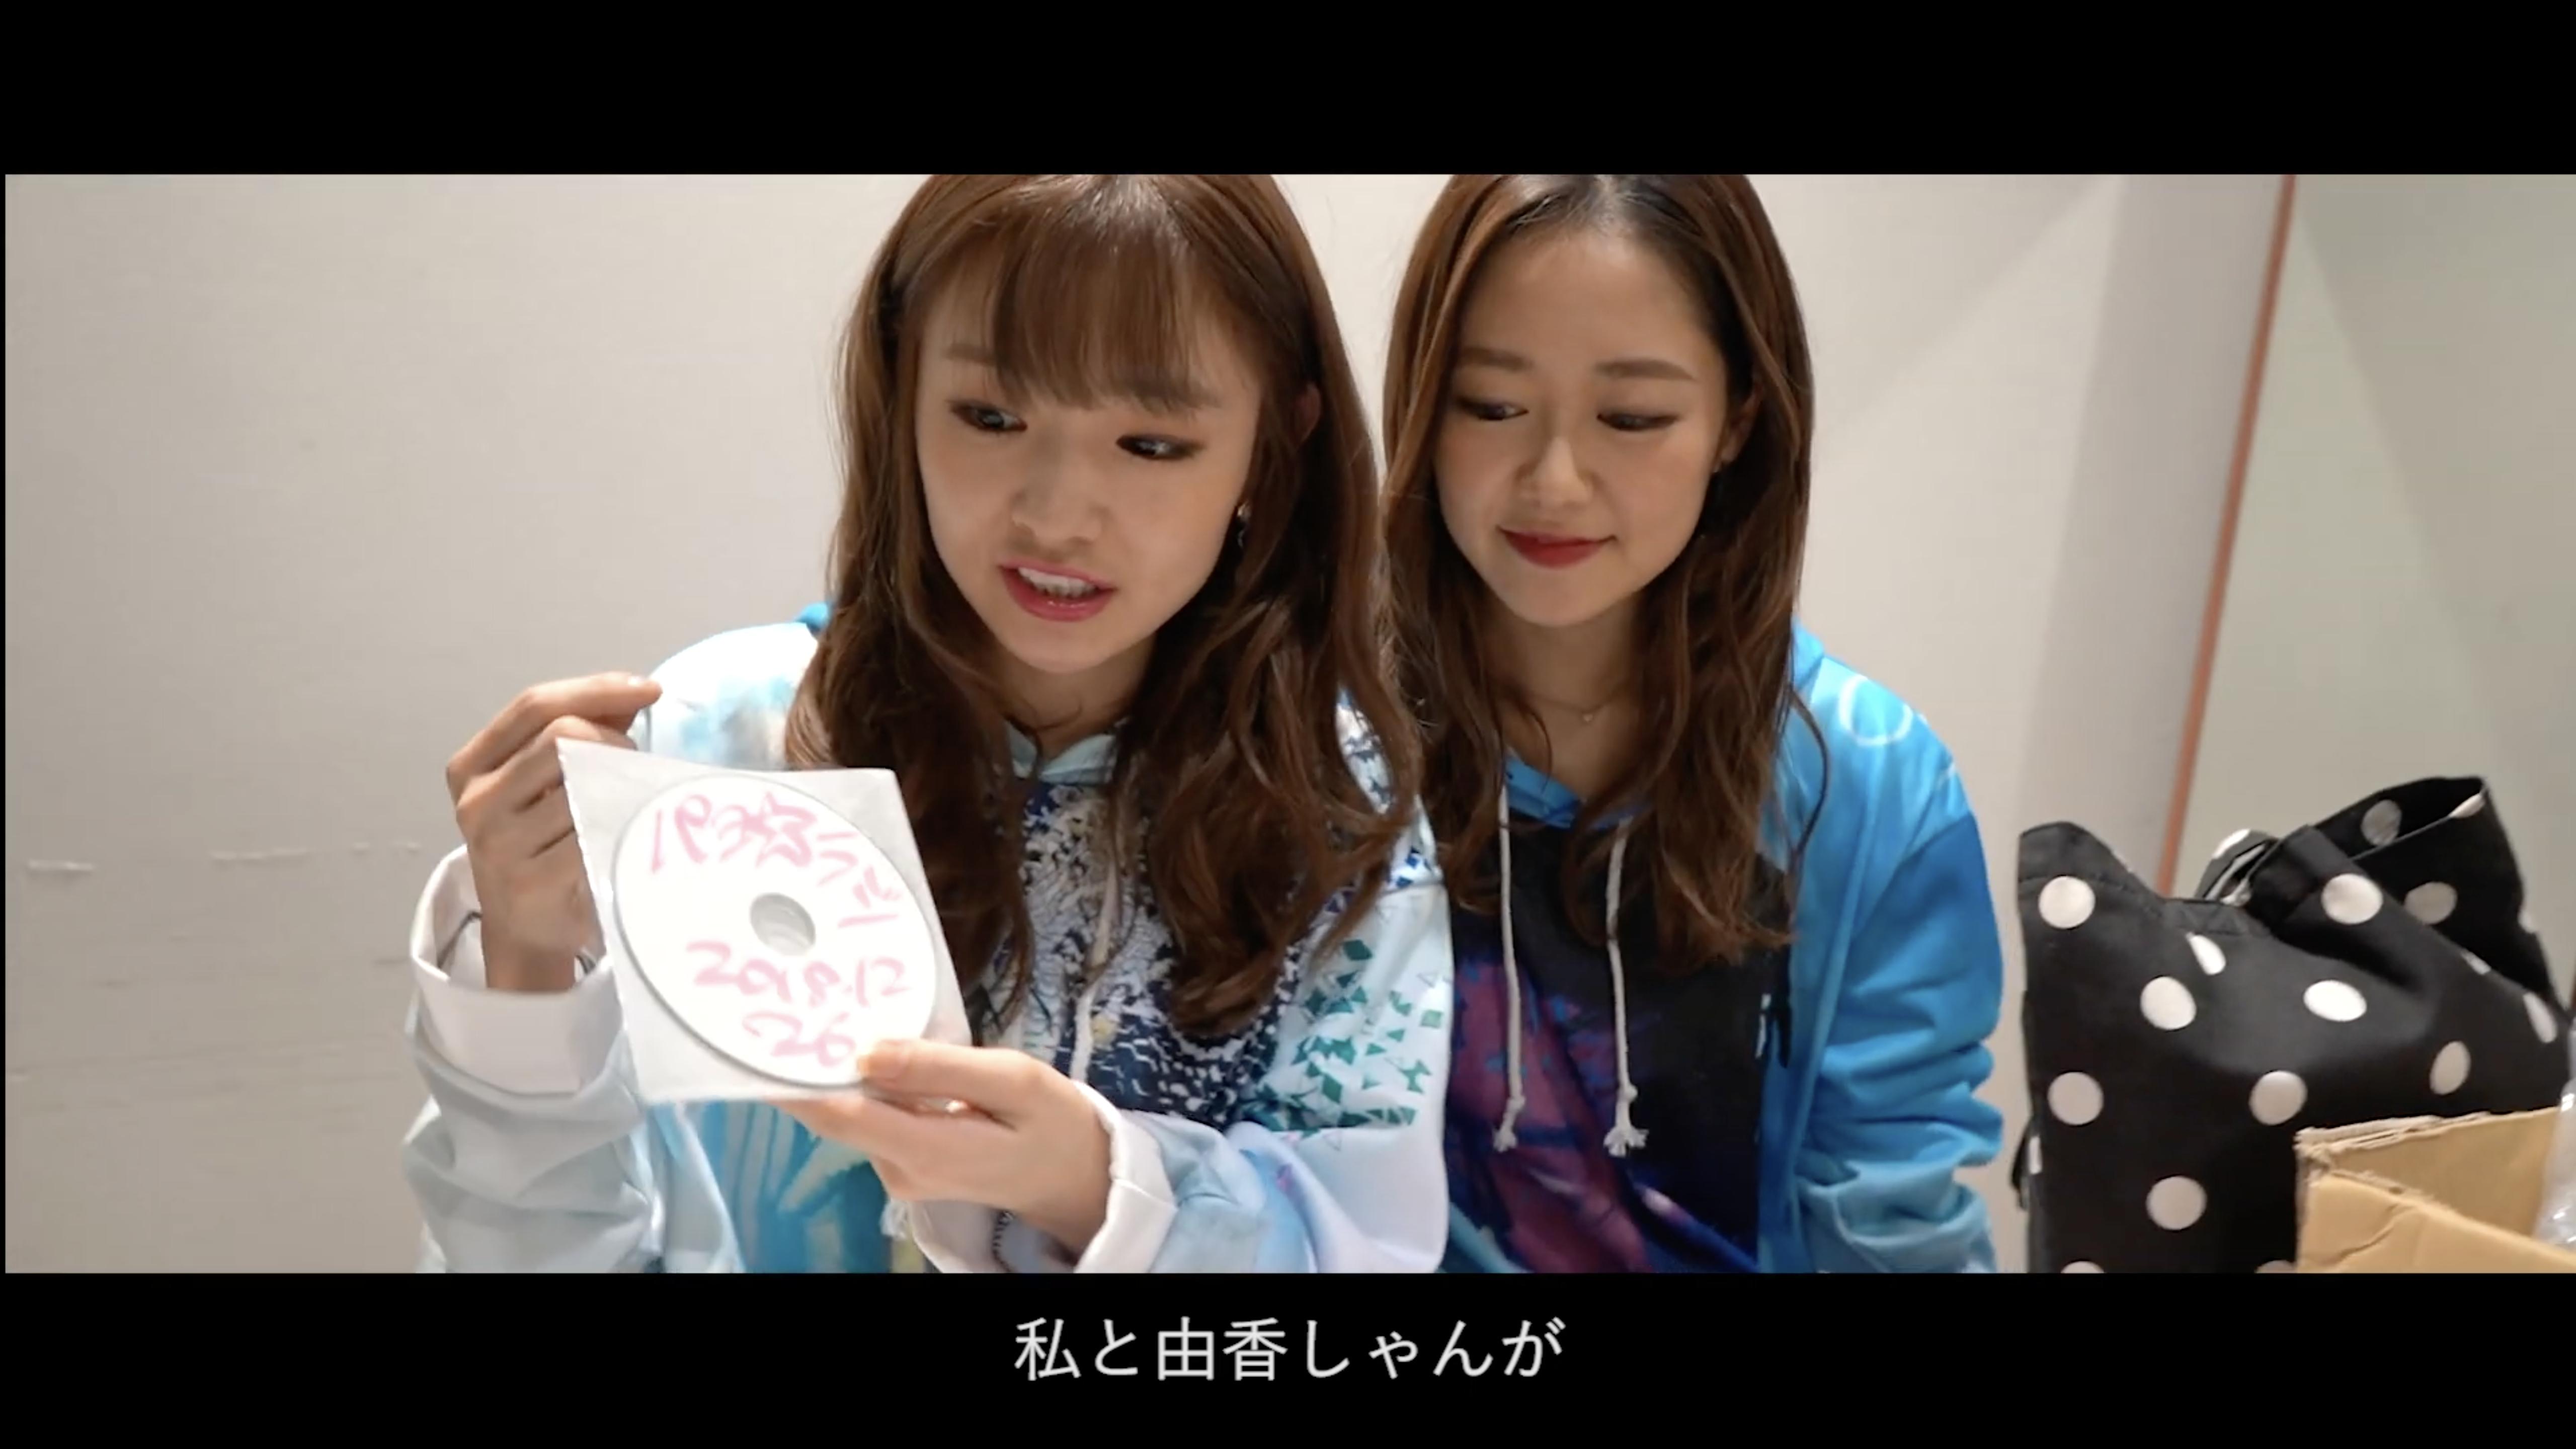 hy4_4yh(ハイパーヨーヨ)ドキュメンタリー第5話 画像03